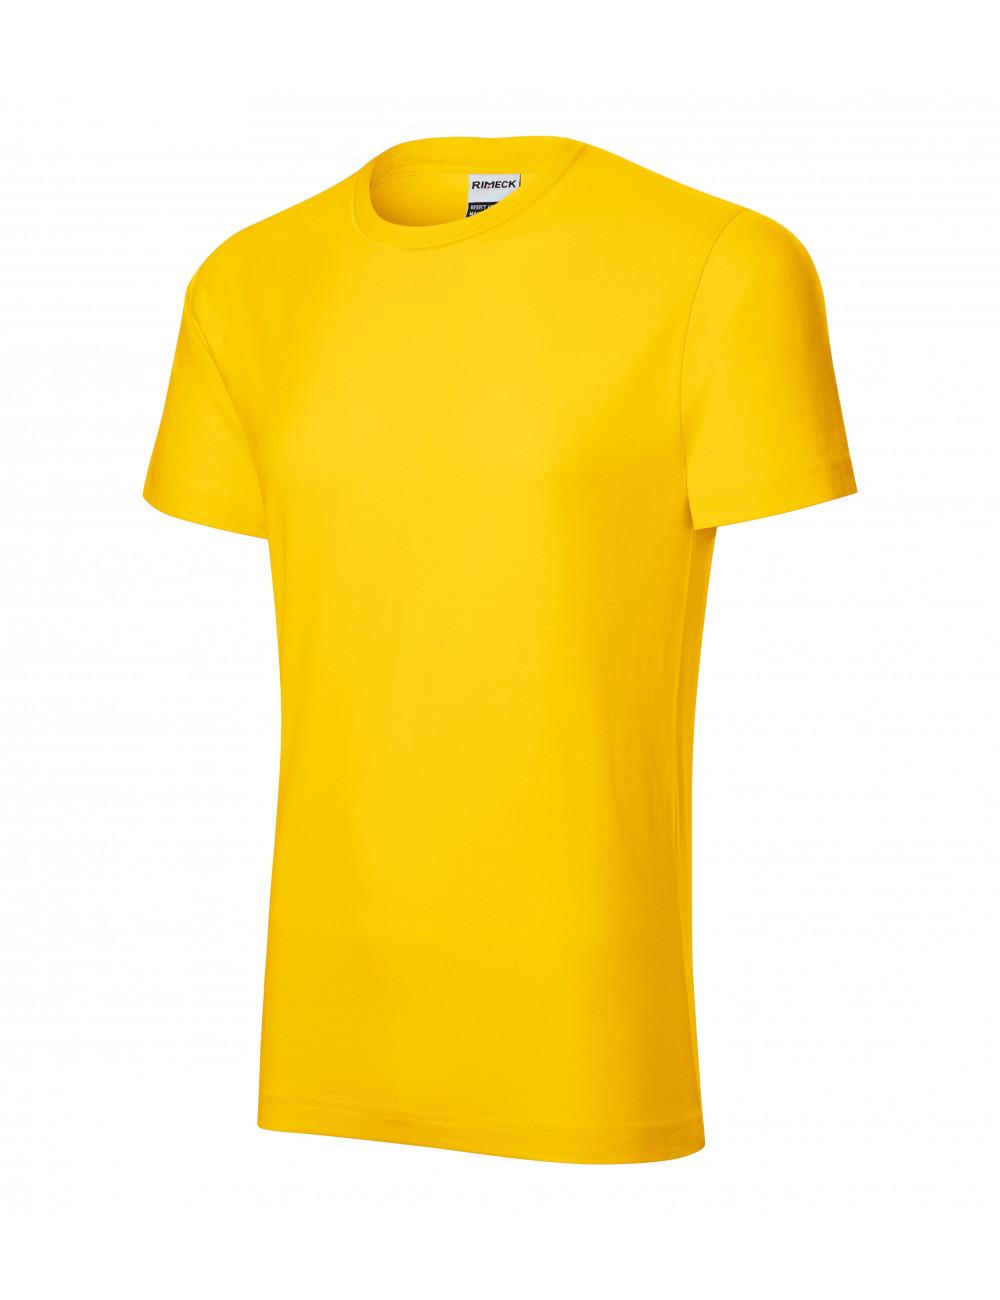 Adler RIMECK Koszulka męska Resist heavy R03 żółty